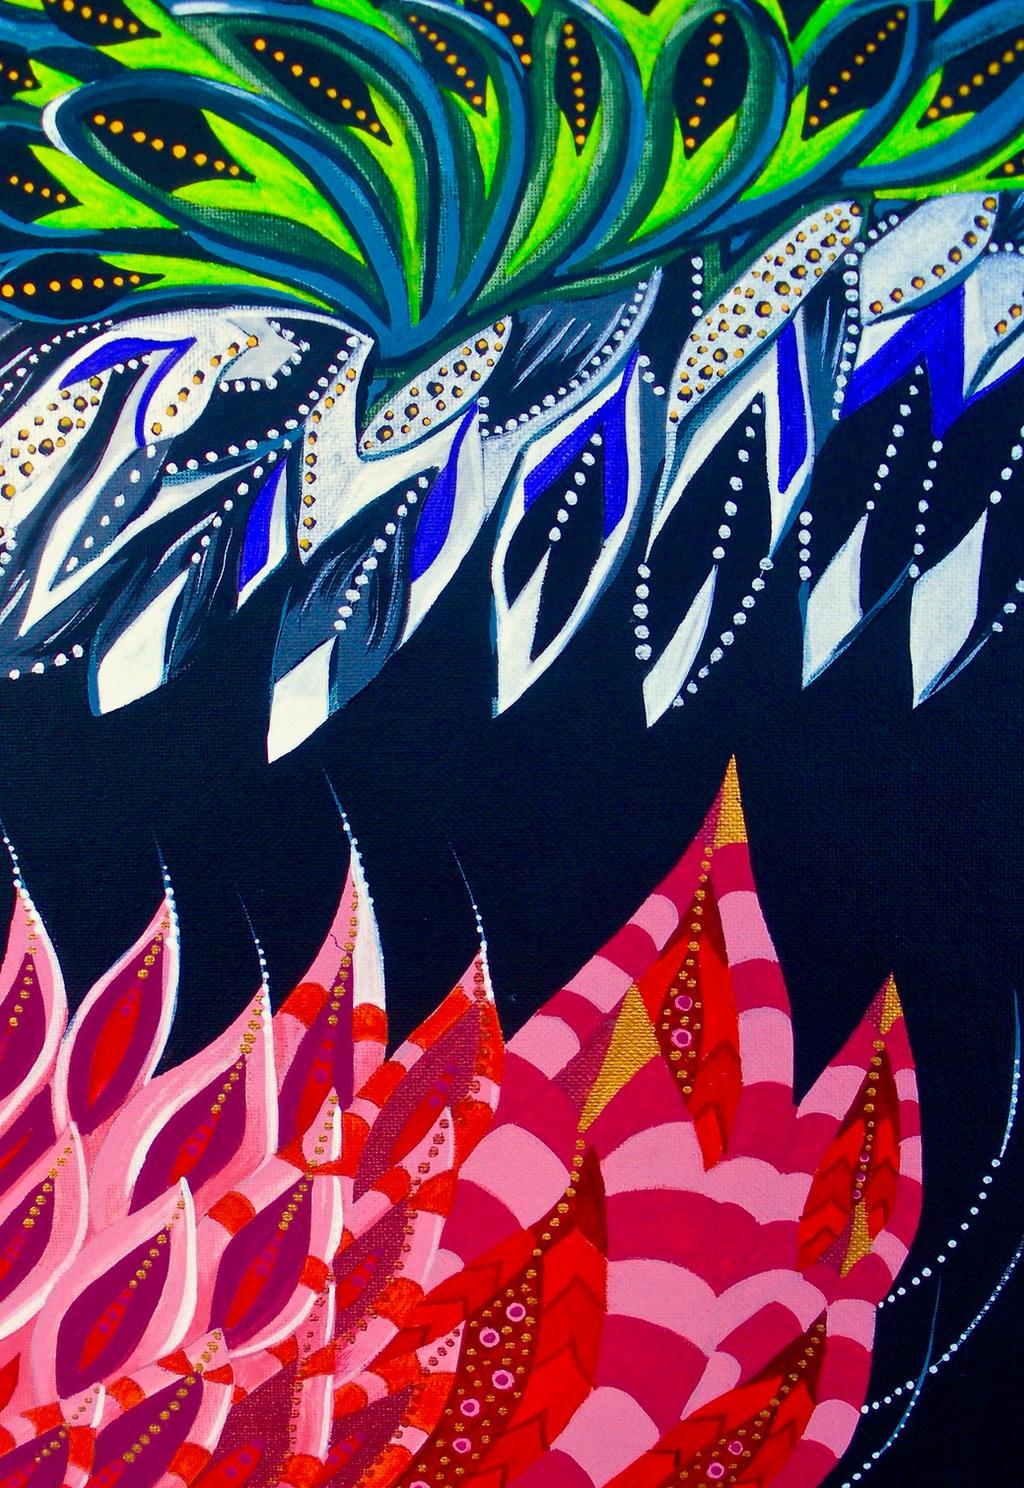 Magpie and Flamingo